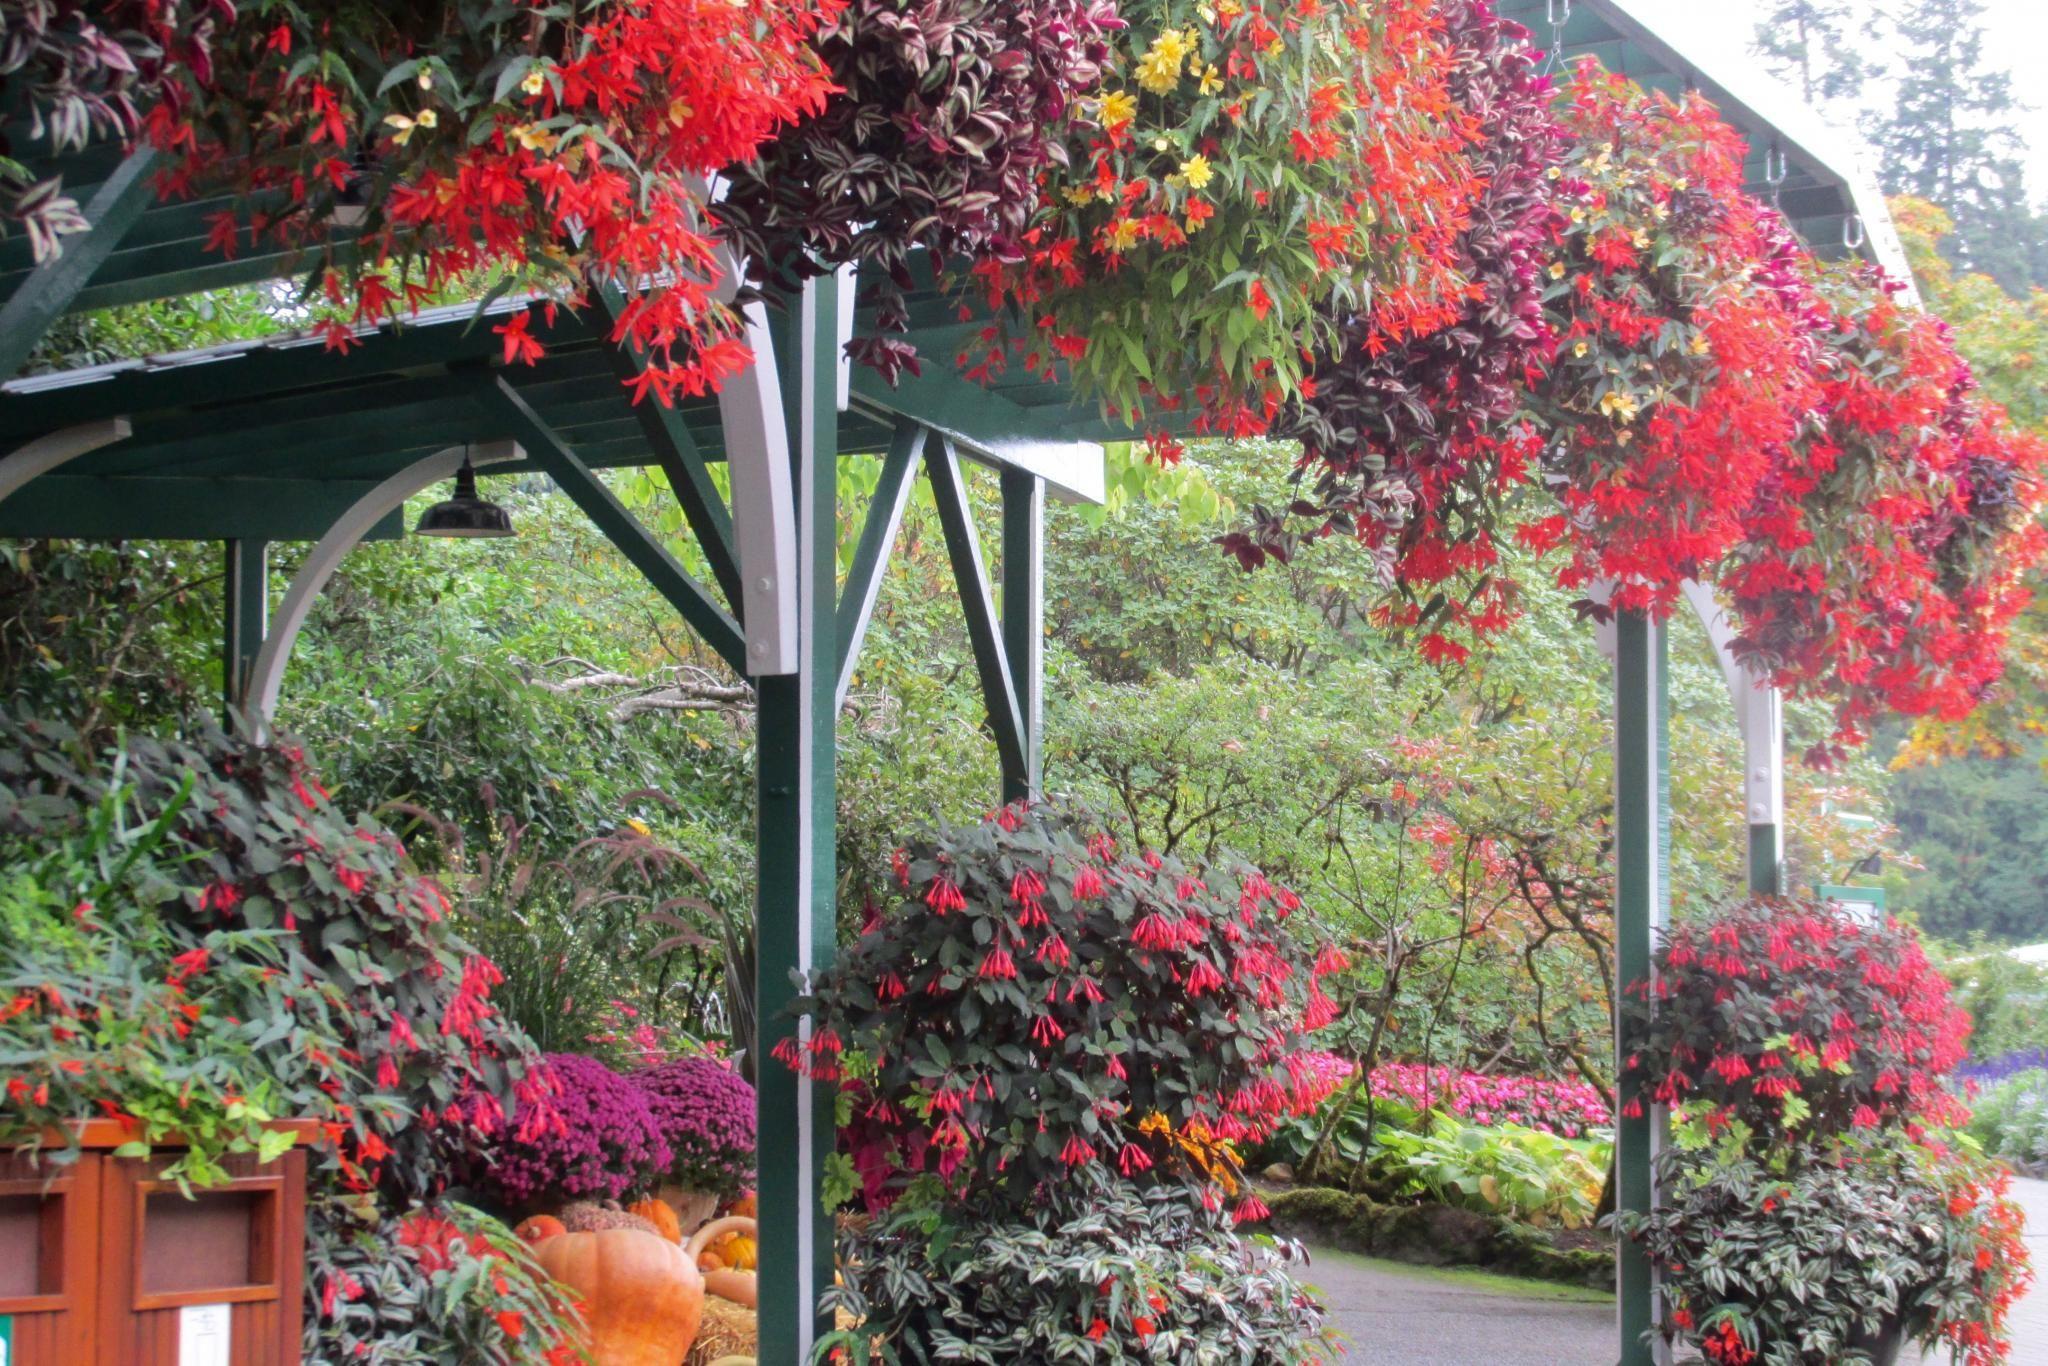 Fall displays at Butchart Gardens #butchartgardens